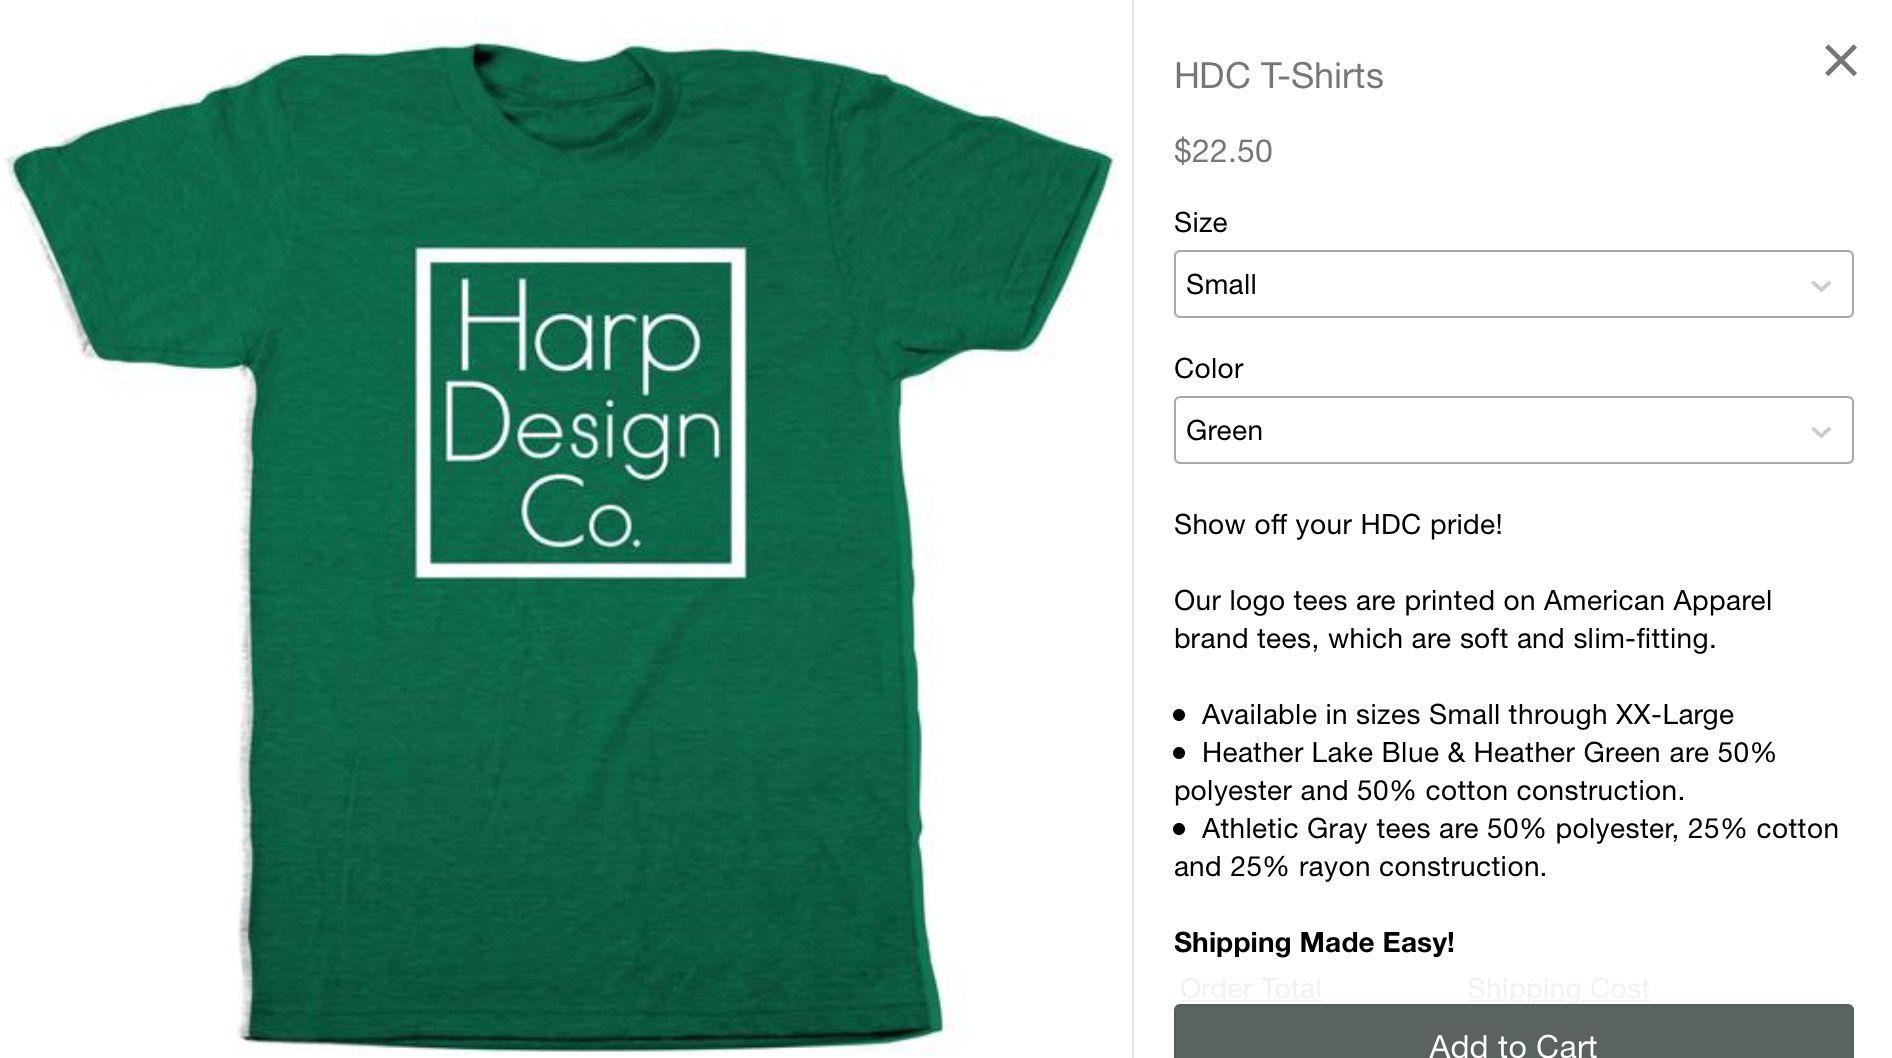 Hdc T Shirts Hgtv Clint Harp Harp Design Co On Fixer Upper